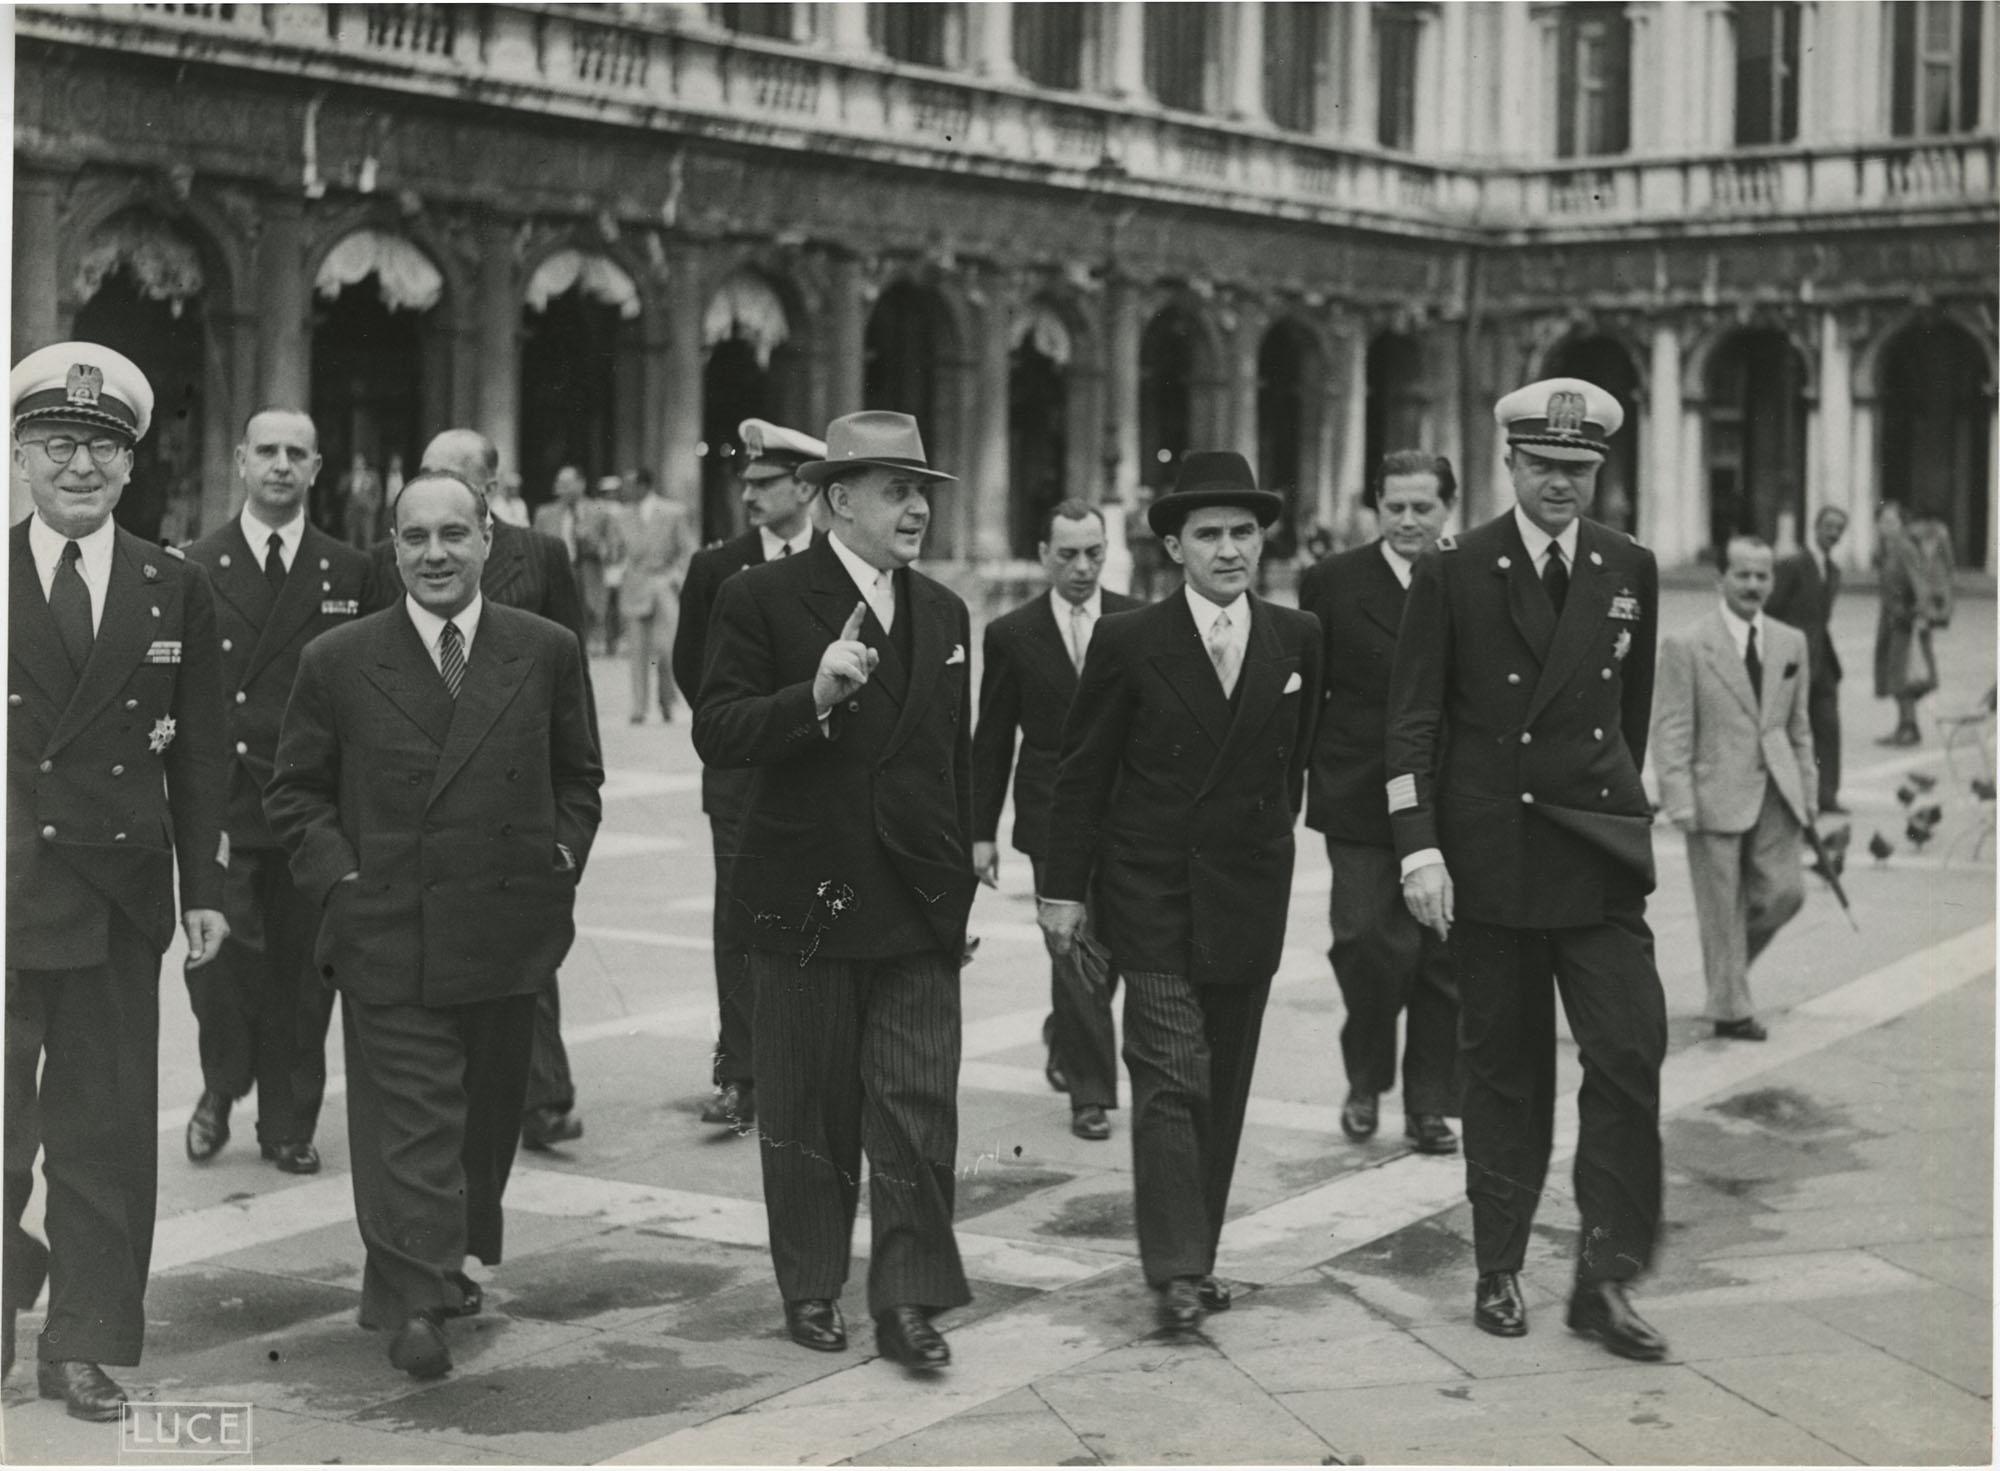 Mihai Antonescu's visit to Benito Mussolini, Photograph 44